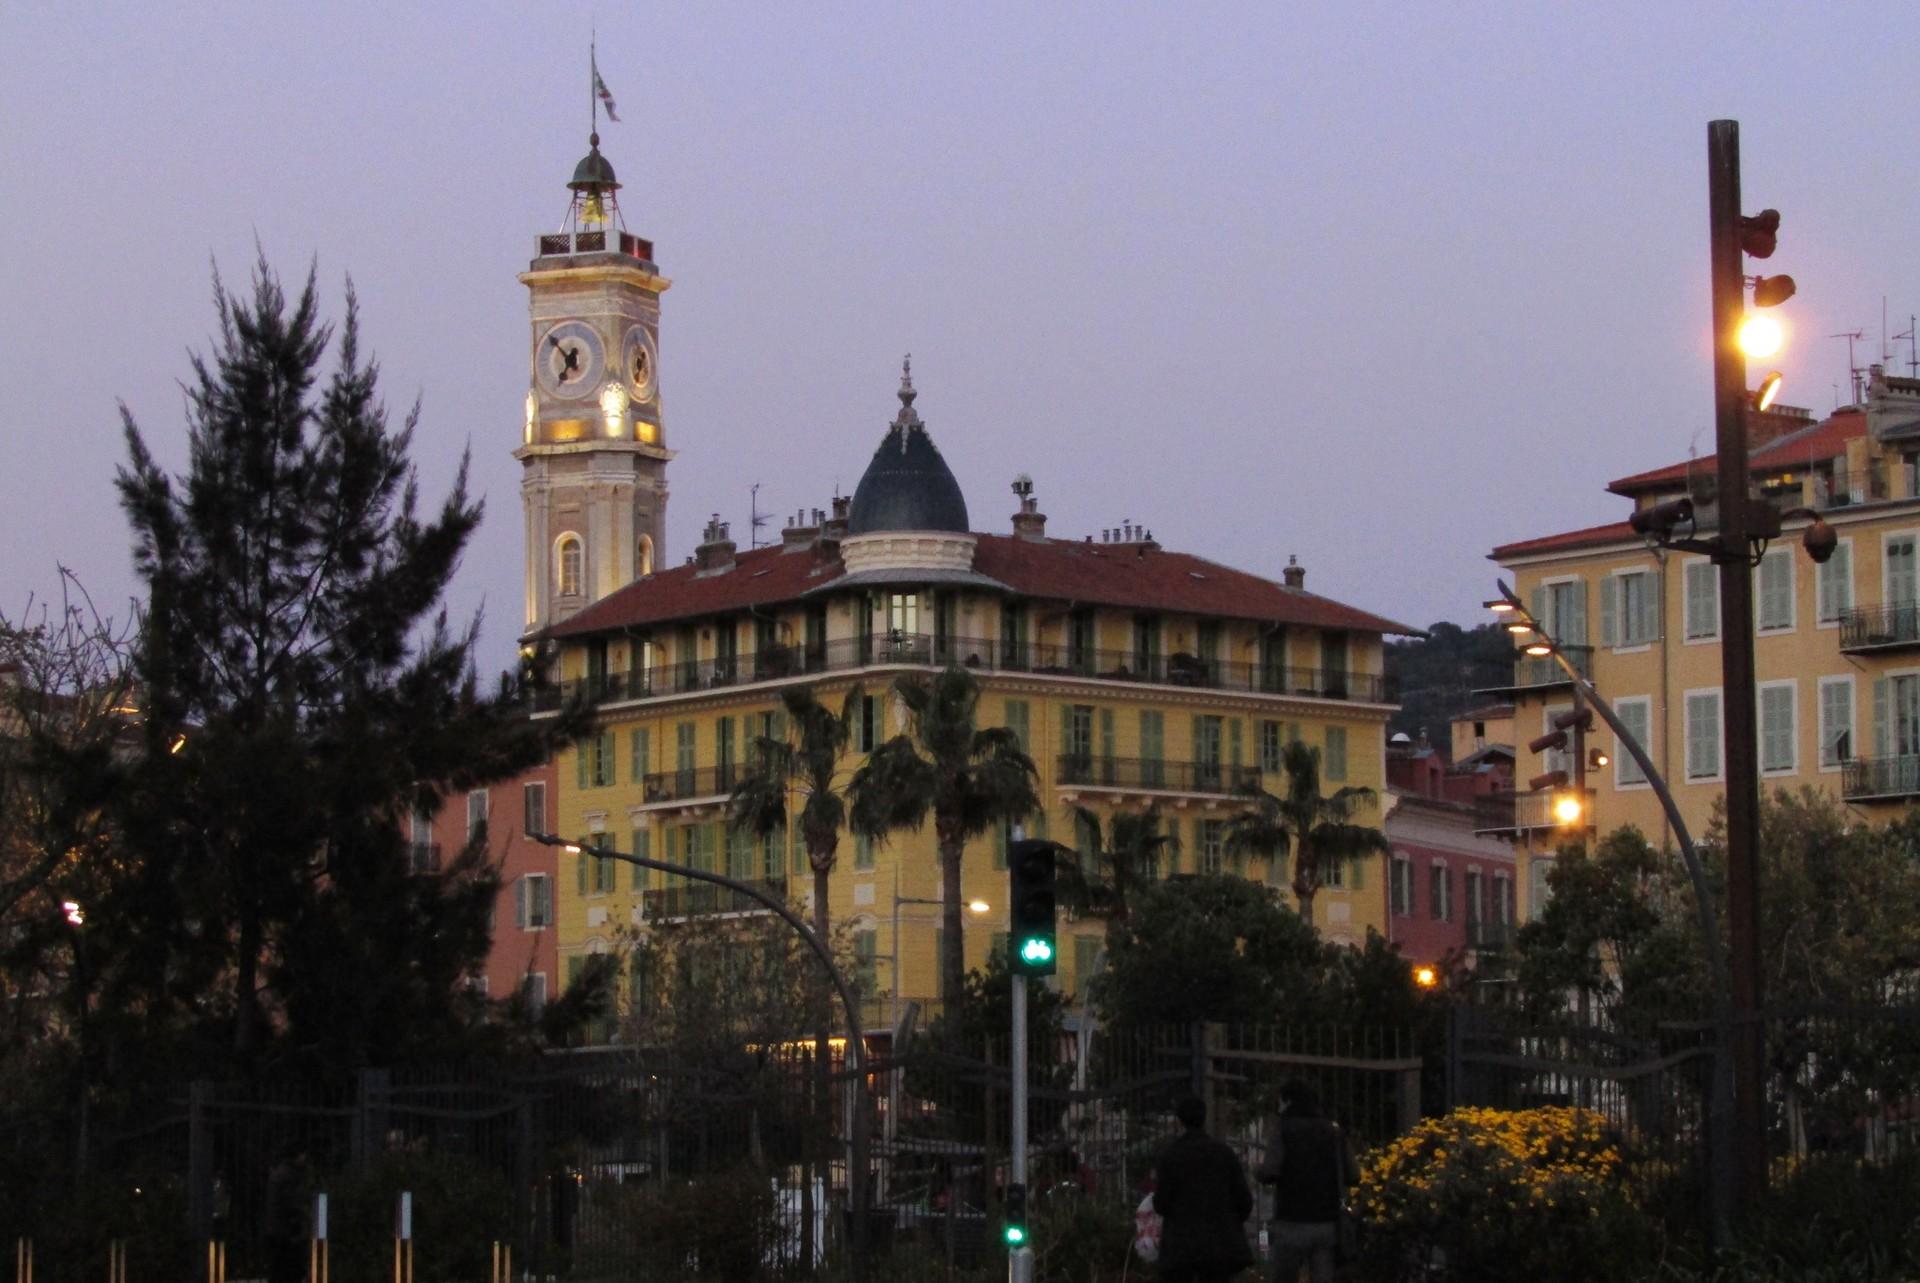 Rumbo a Mónaco